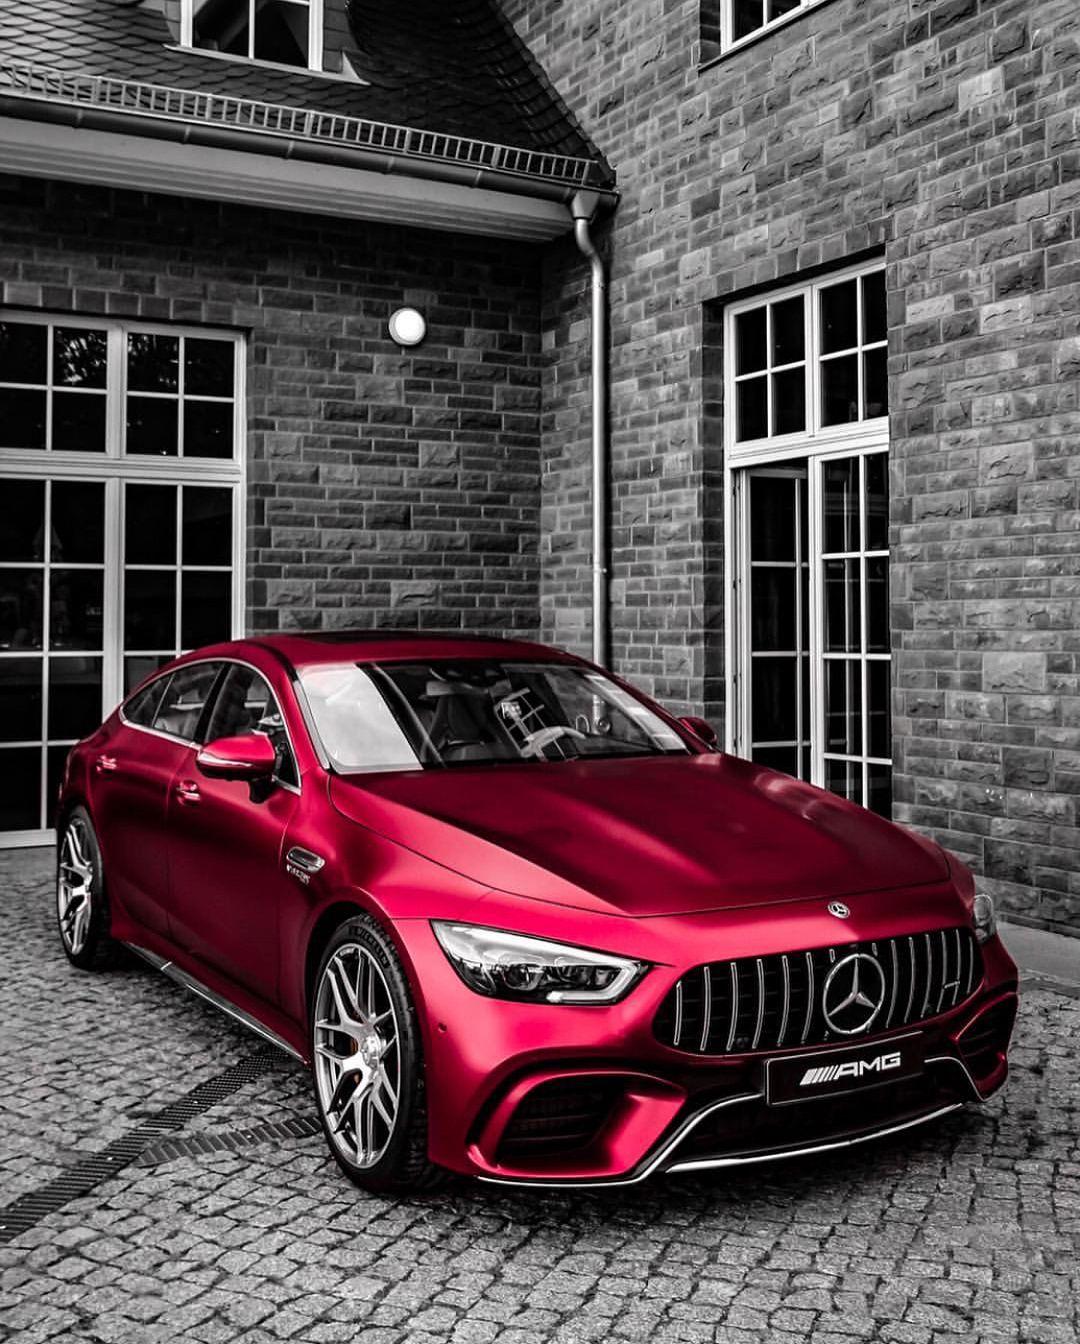 Red Luxury Cars: Мерседес Amg, Роскошные автомобили